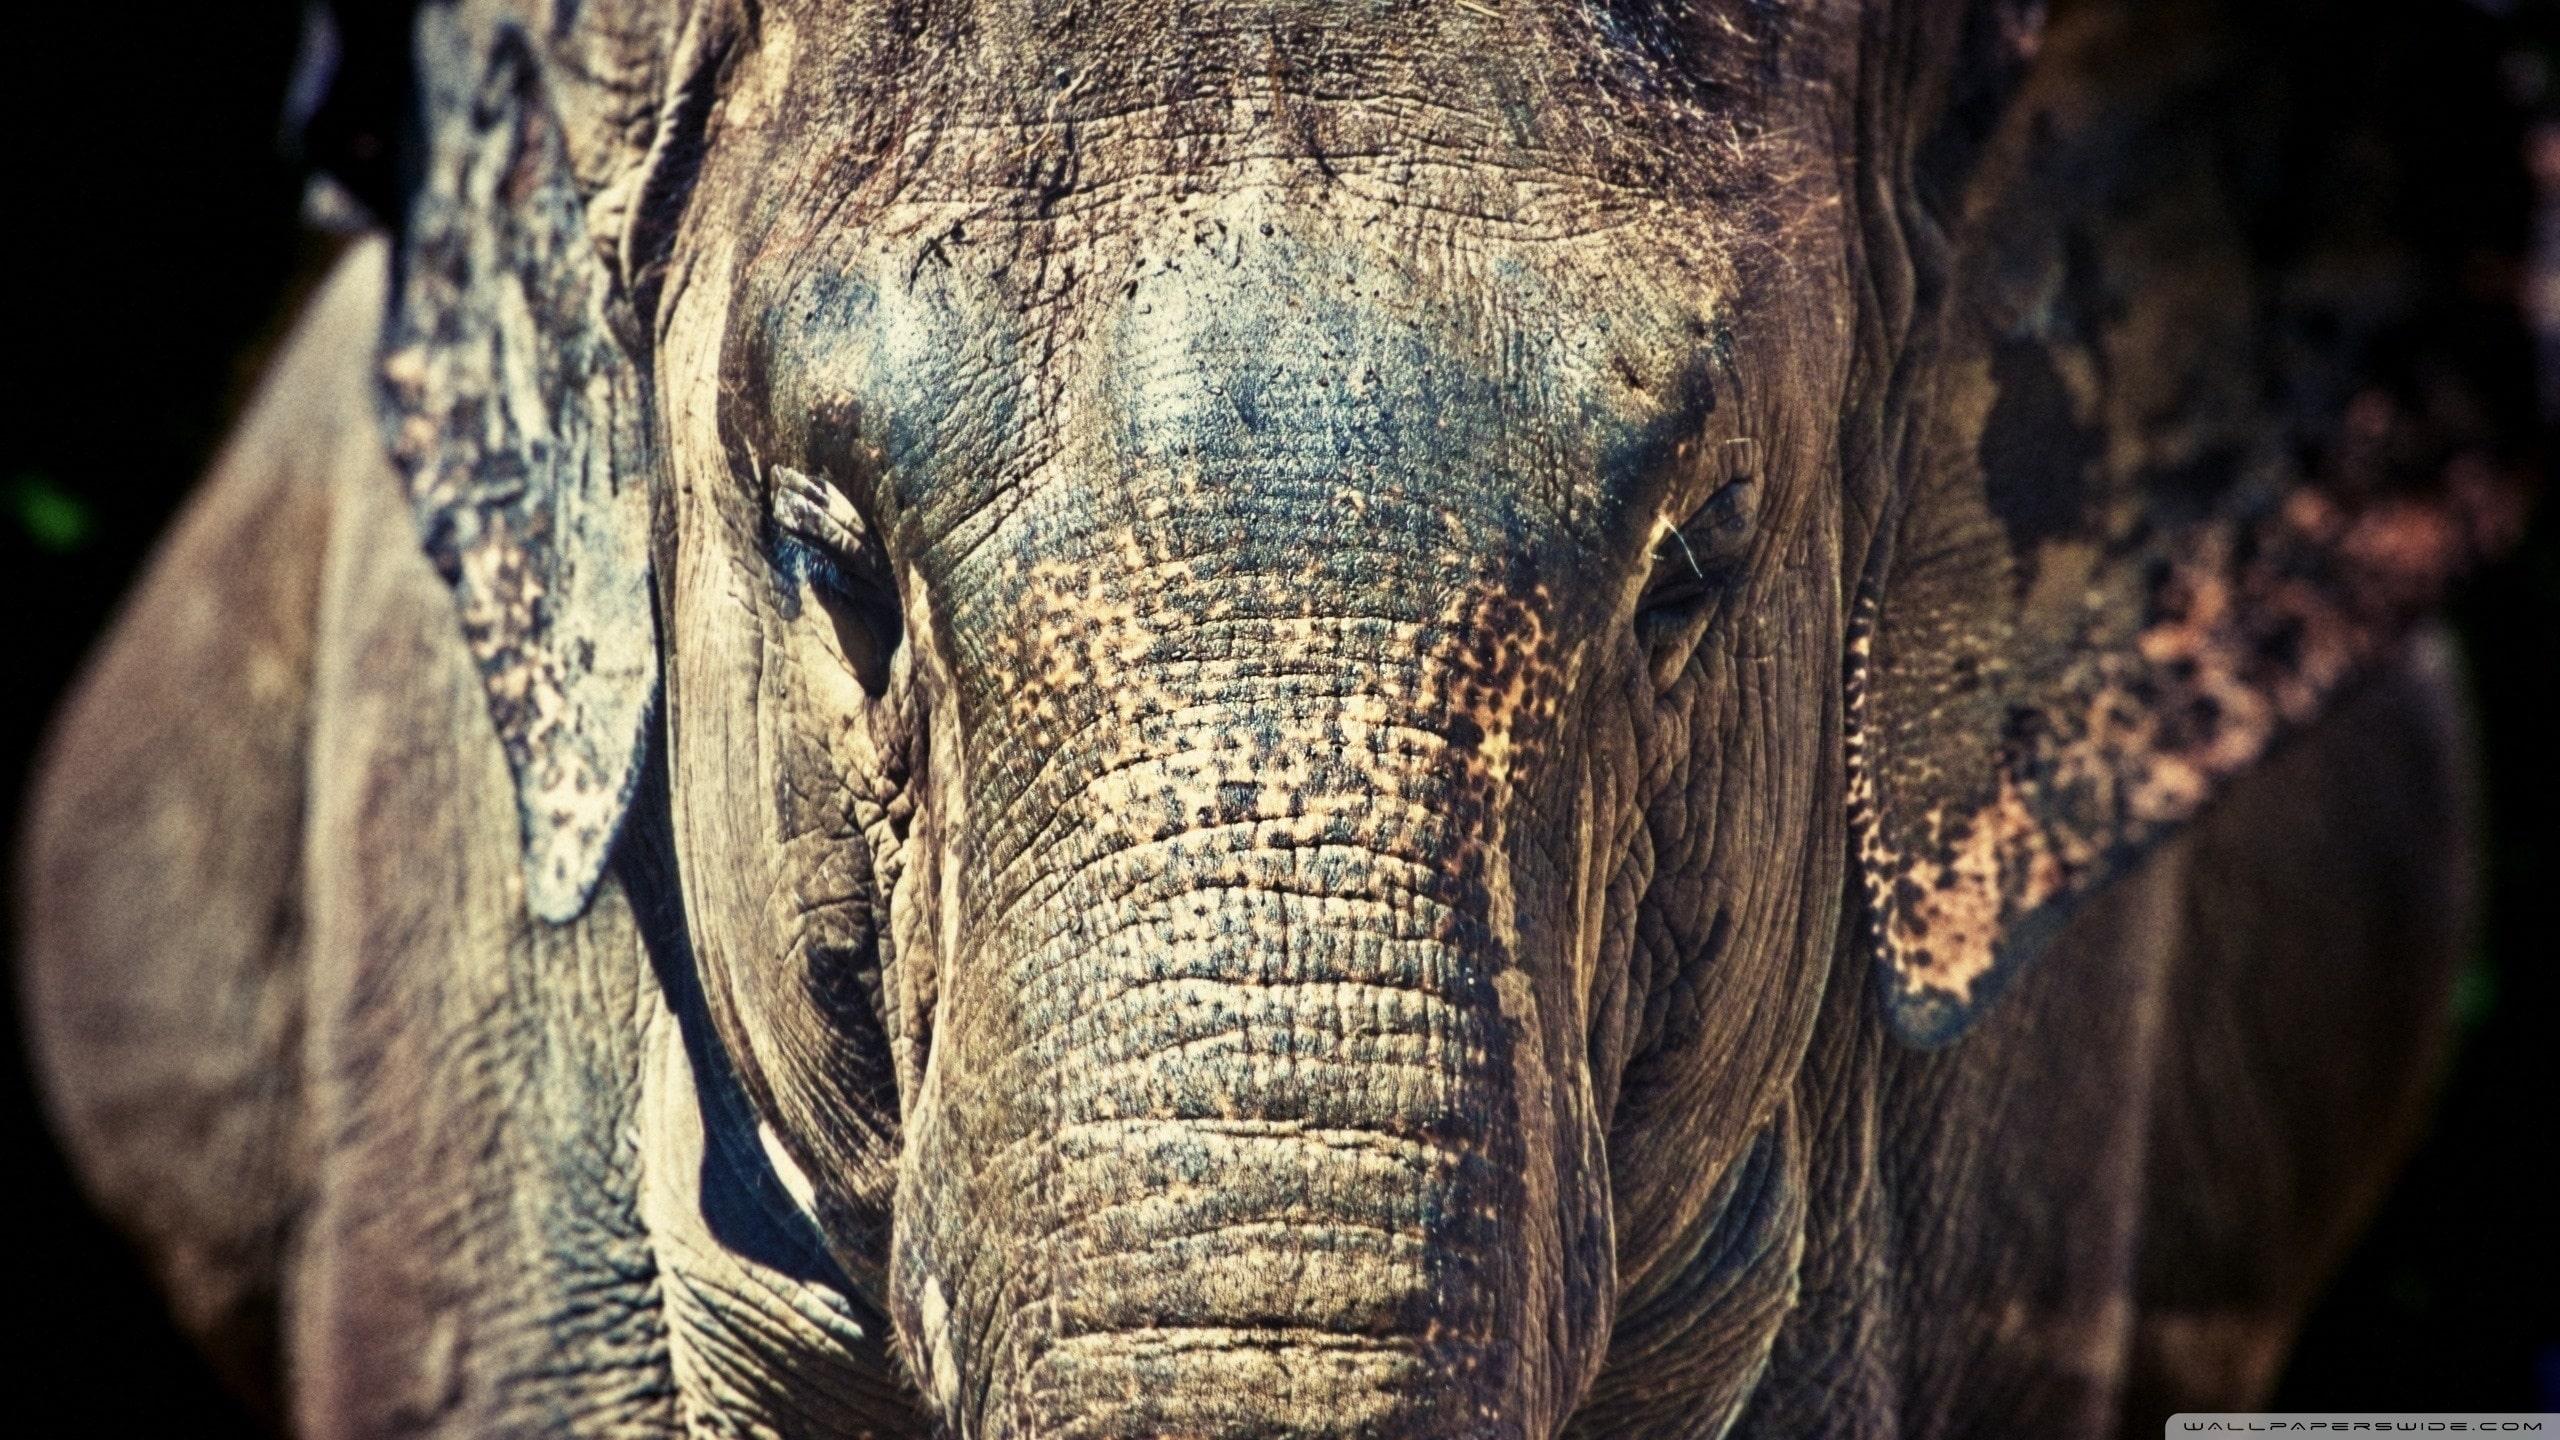 200 Fondos De Pantalla De Animales Salvajes Para Mac I